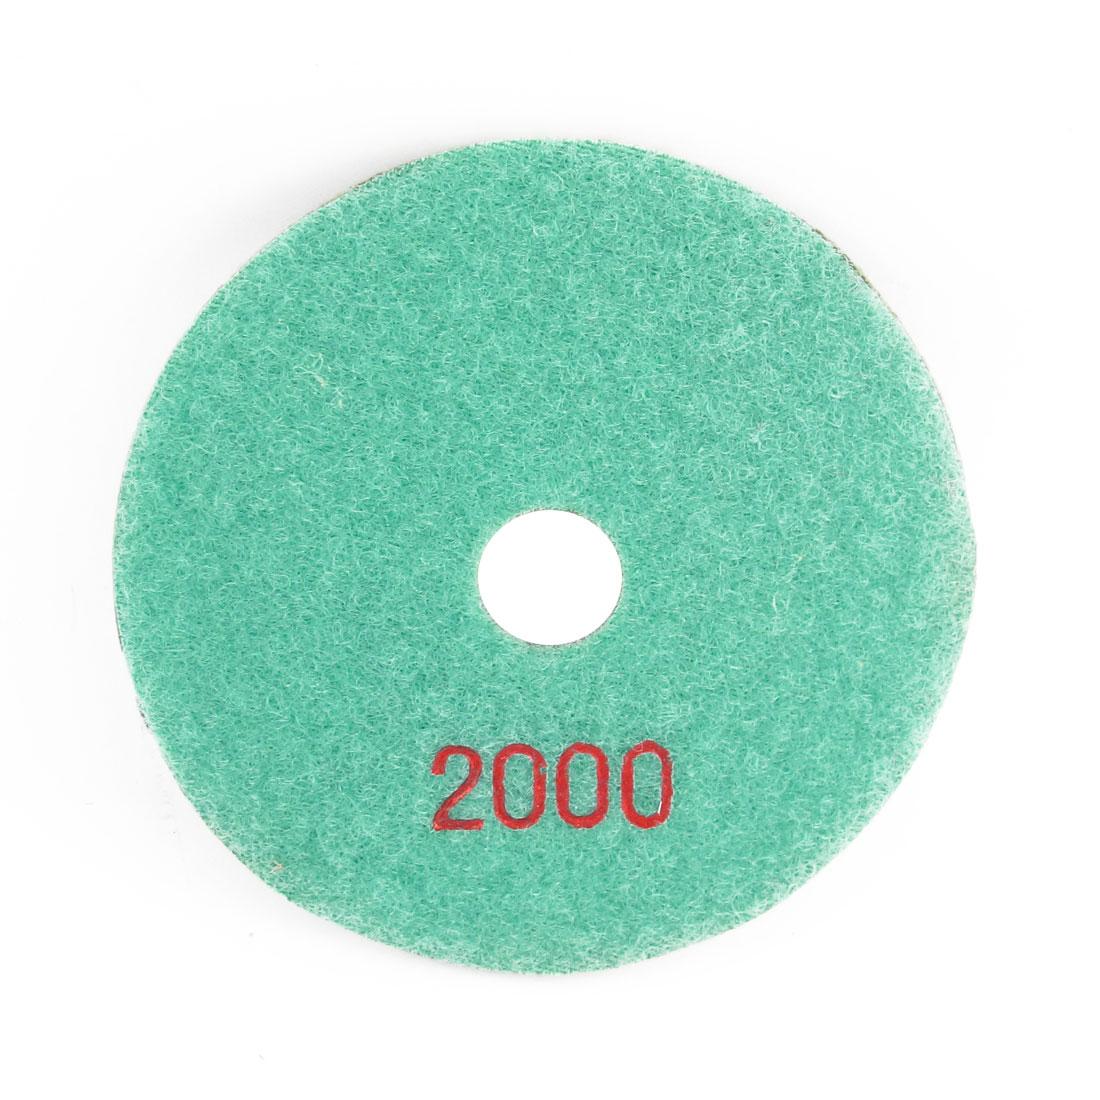 Granite Concrete Buffing Wet Dry Diamond Resin Polishing Pad 2000 Grit 10cm